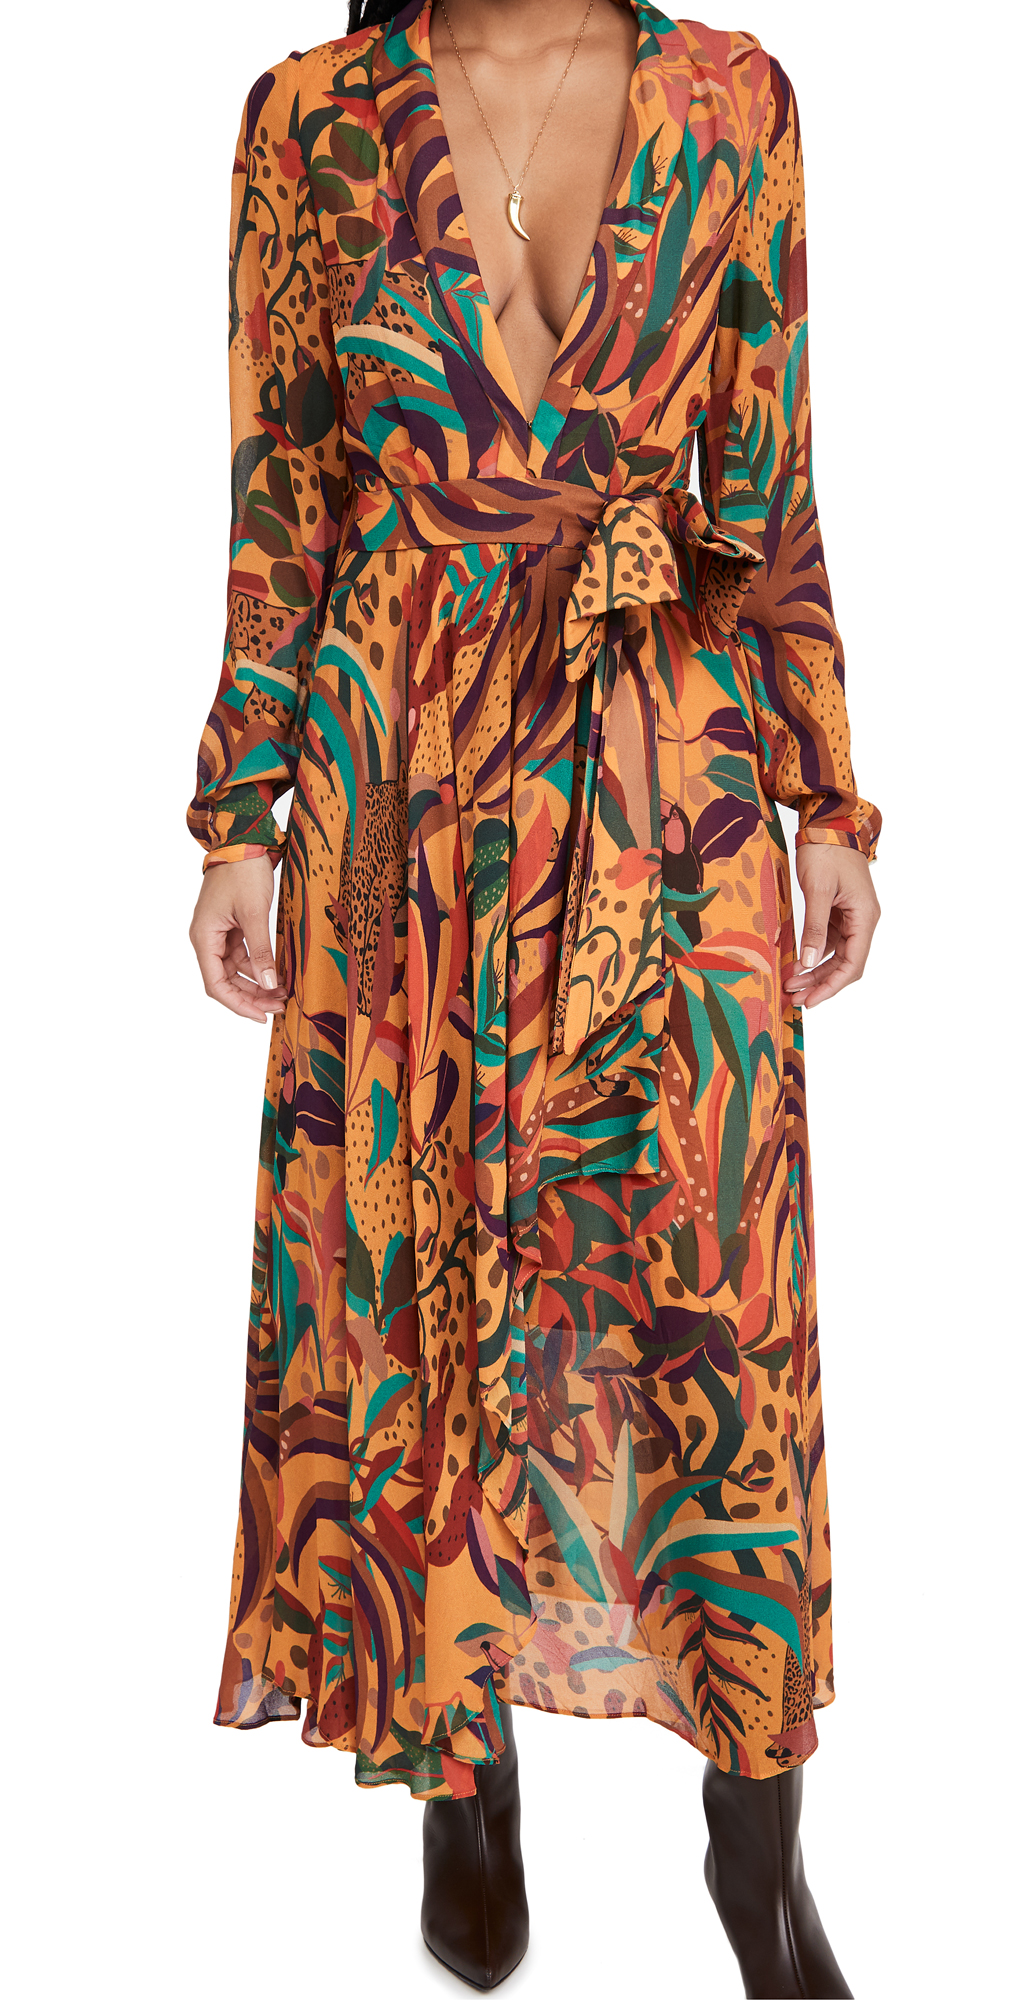 FARM Rio Golden Jungle Maxi Dress